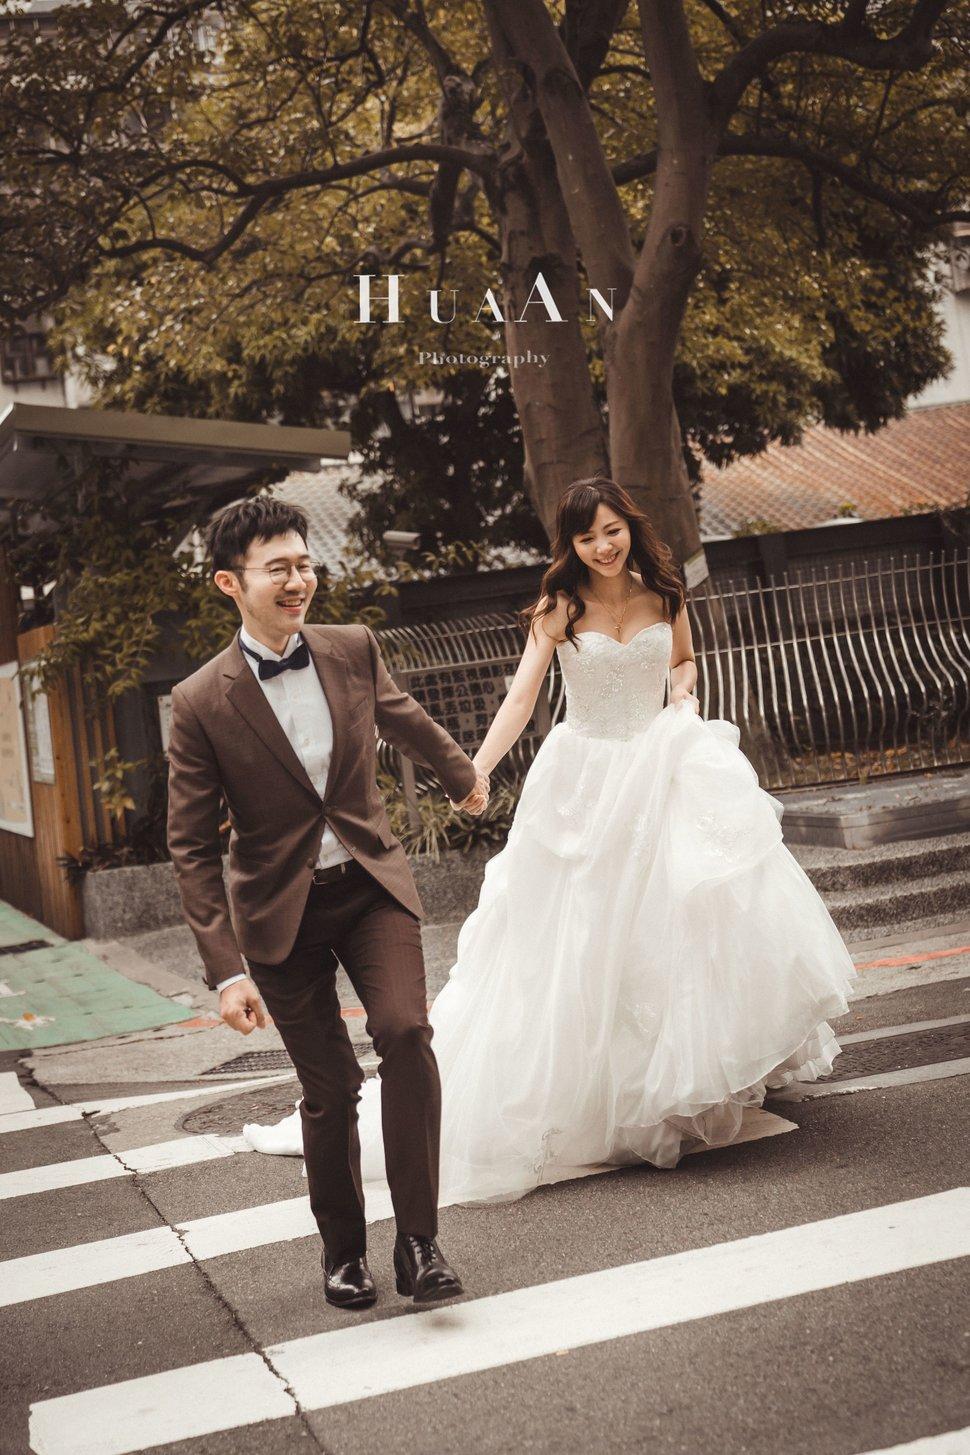 HUA00869 - Huaan Photography《結婚吧》